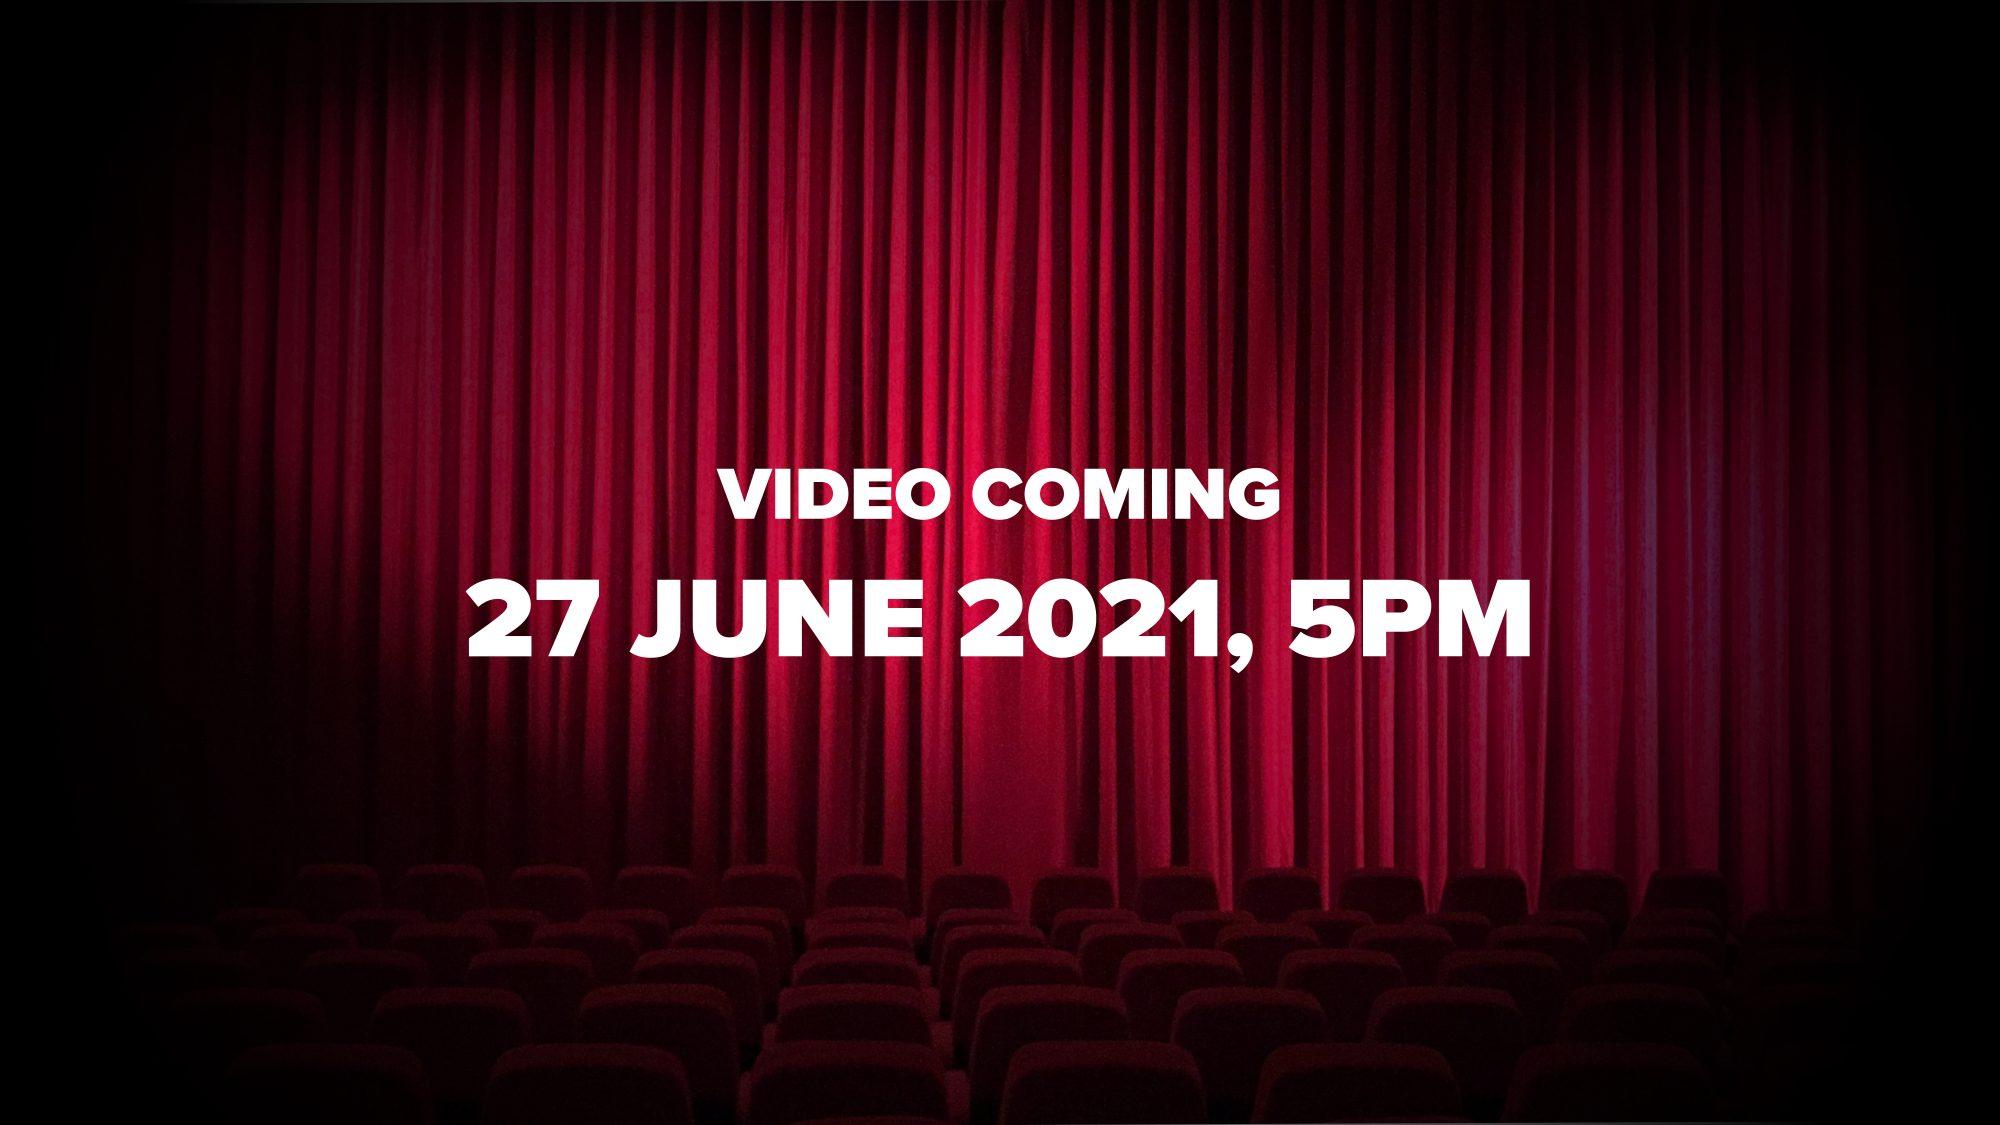 Video Coming 27 June 2021, 5pm